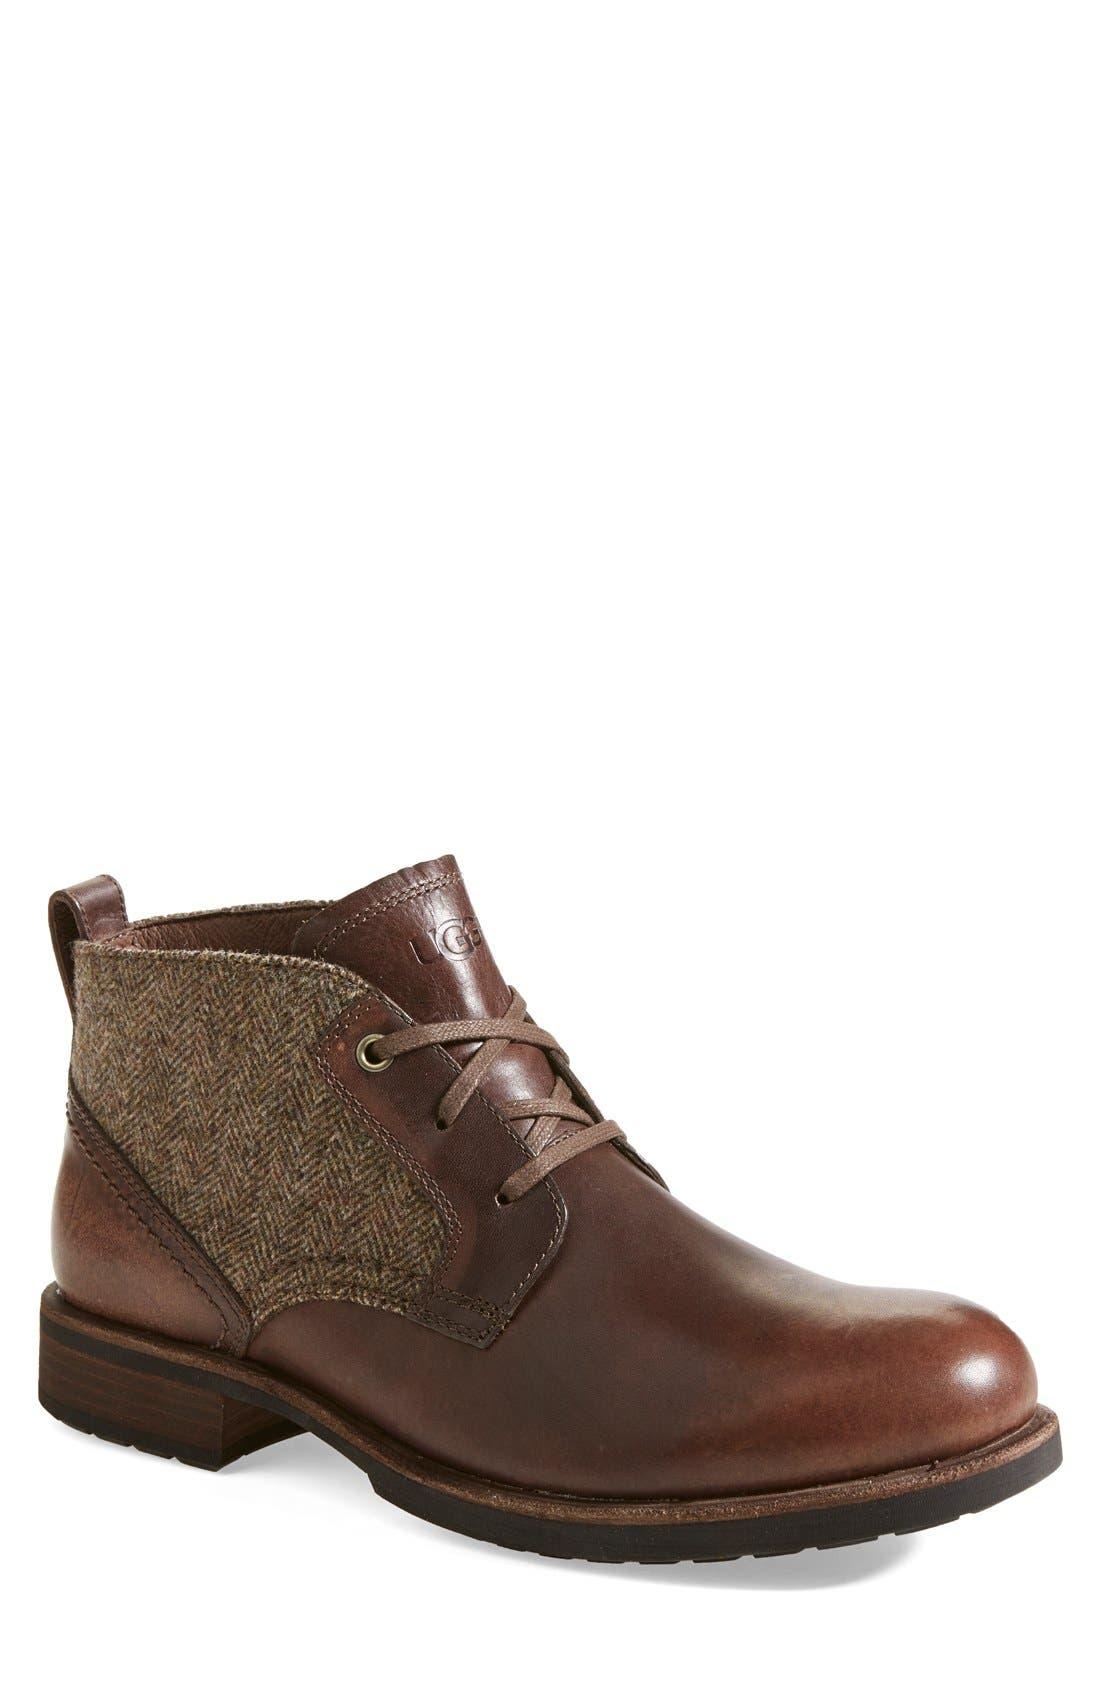 Main Image - UGG® Australia 'Brompton' Chukka Boot (Men)